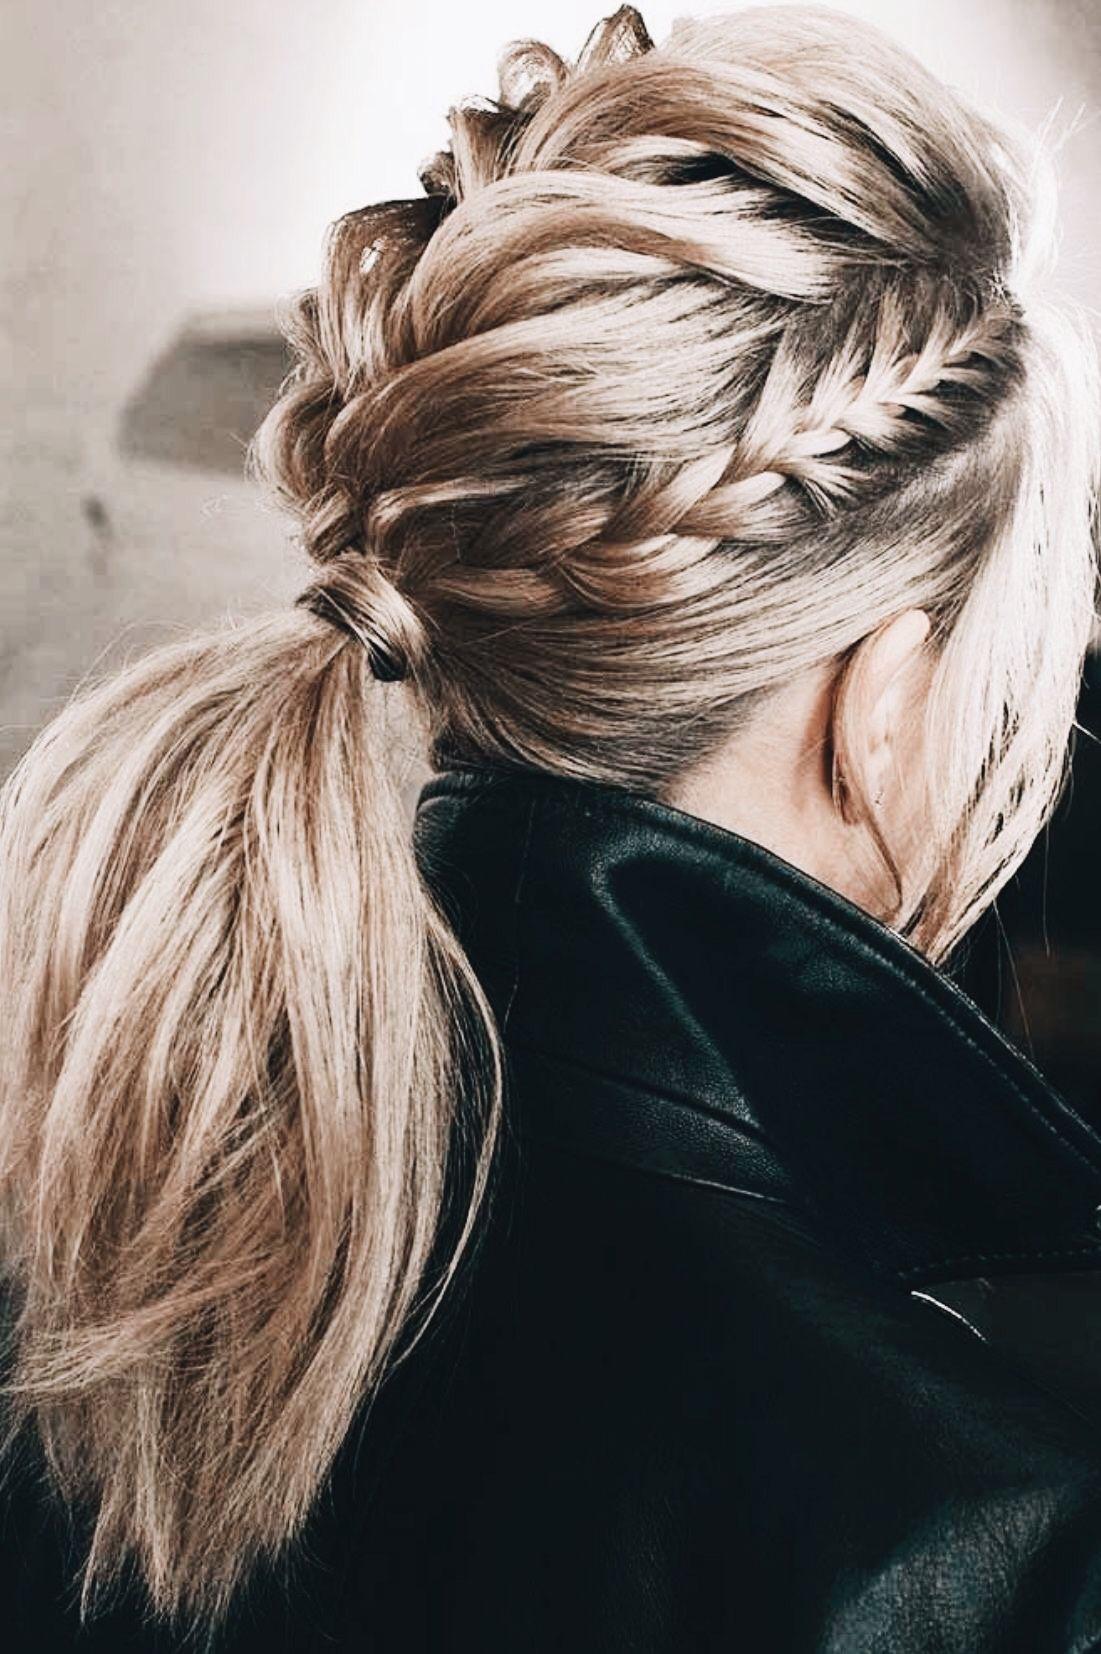 Pin by simone strickland on hair in pinterest hair hair